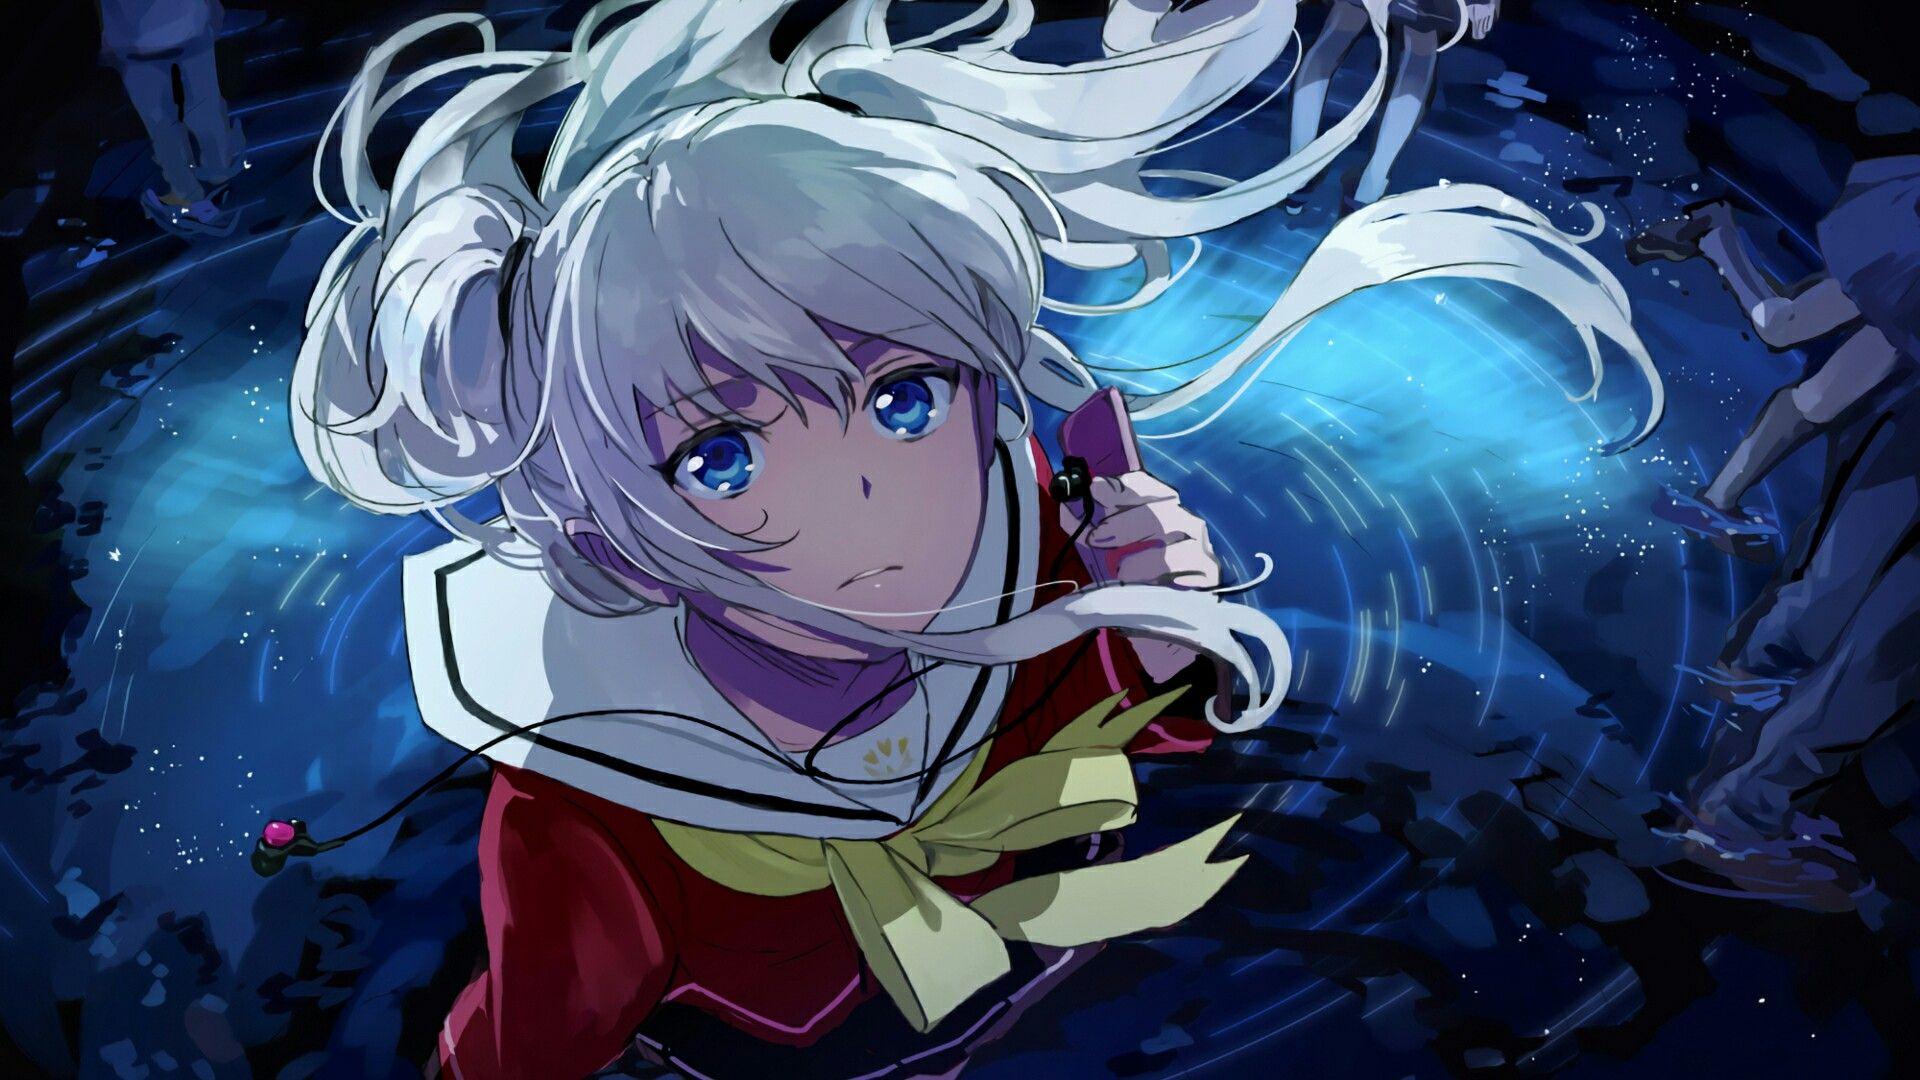 Pin De Jennifer Em Solo Anime Charlotte Anime Wallpapers Hd Anime Papel De Parede Anime Download wallpaper anime charlotte hd